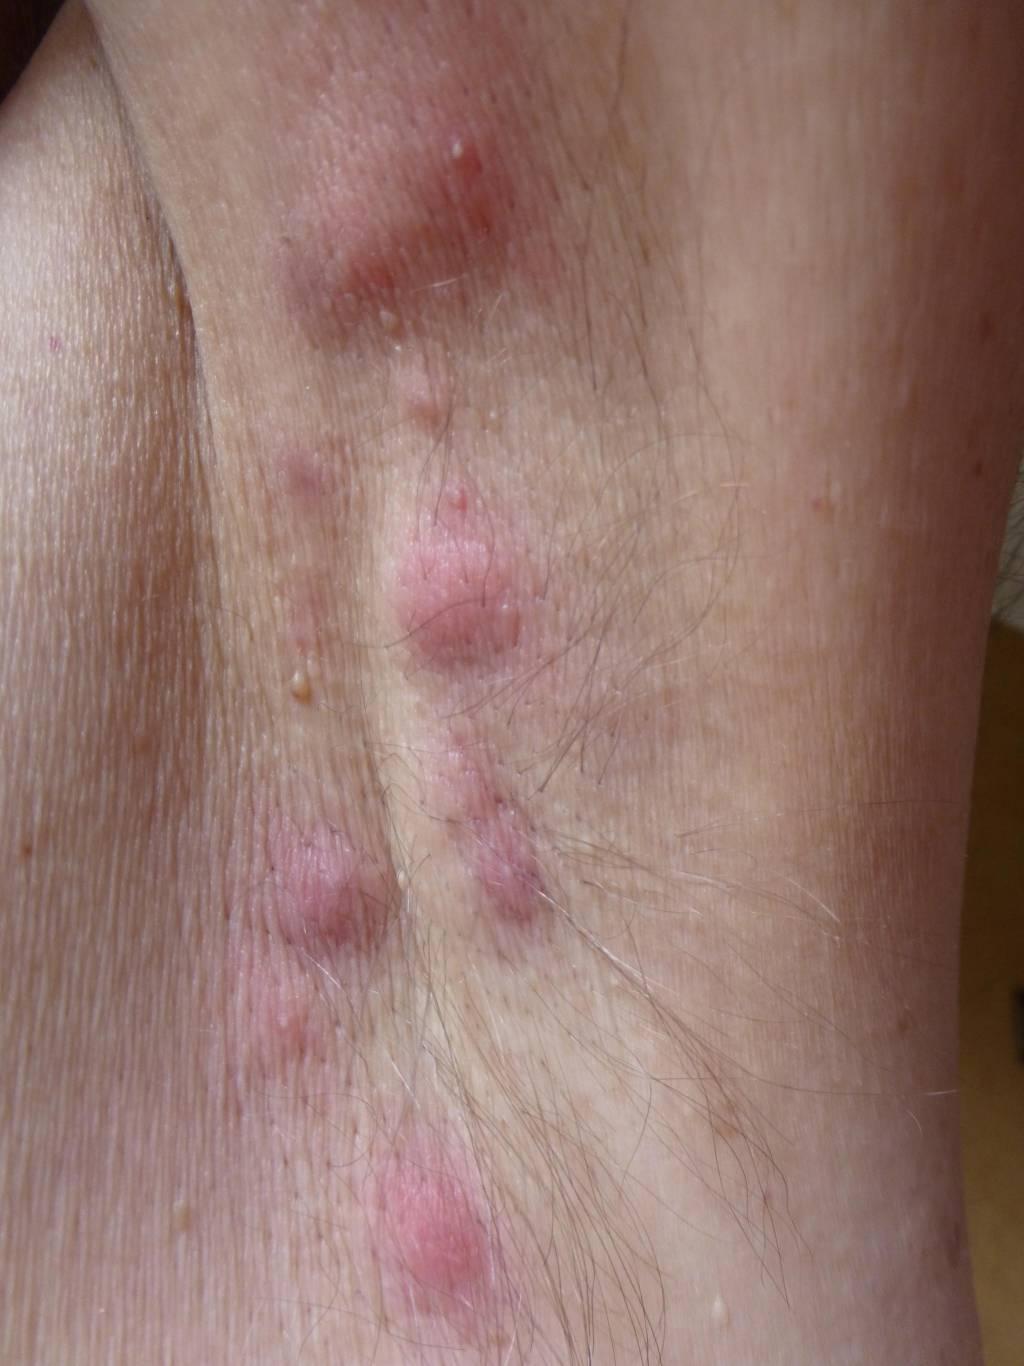 Inversa intim akne «L'acné qui